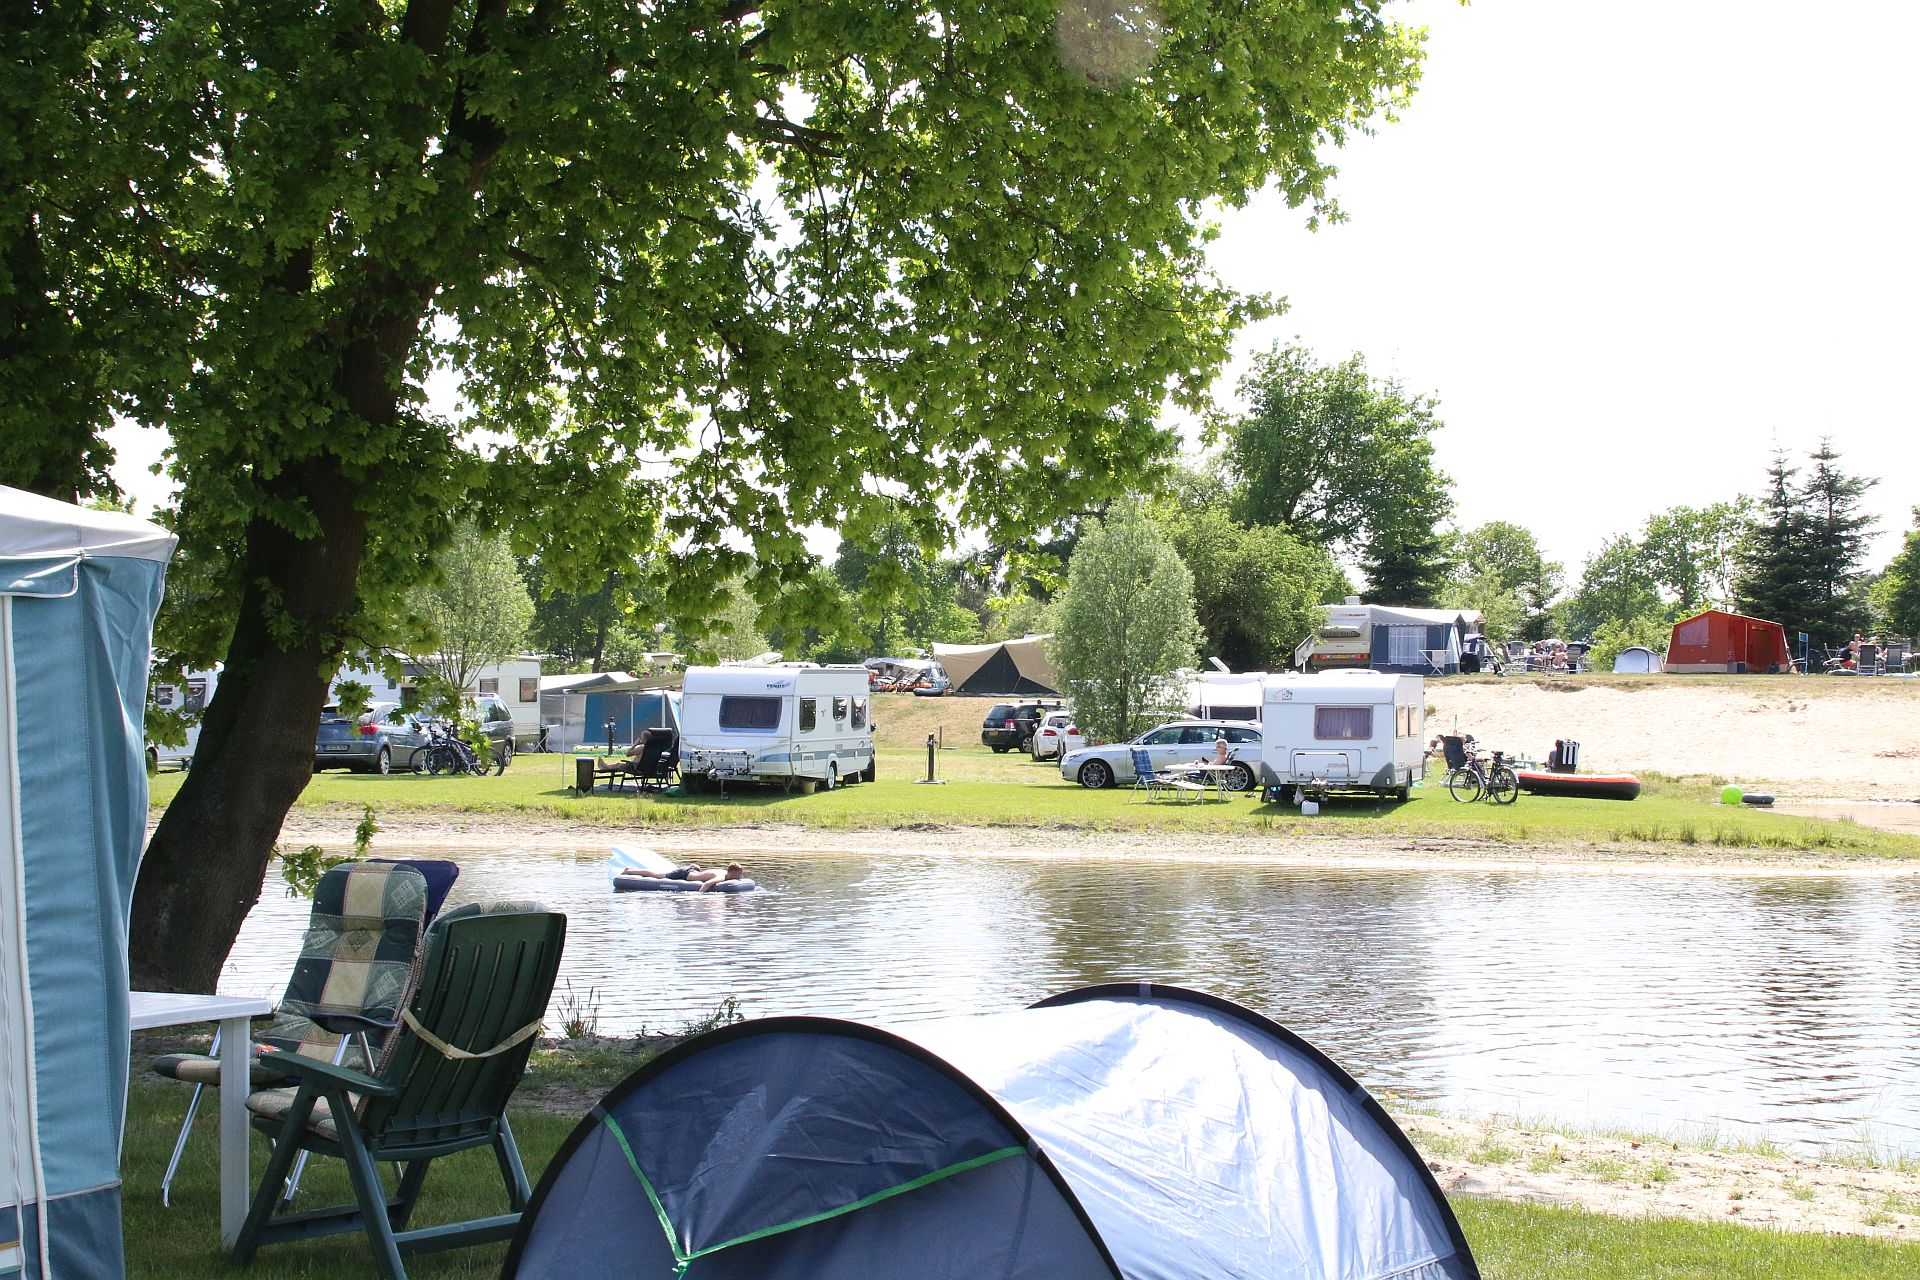 Maak bij ons gebruik van uw ACSI campingcard Overijssel! - ACSI campingcard in Overijssel